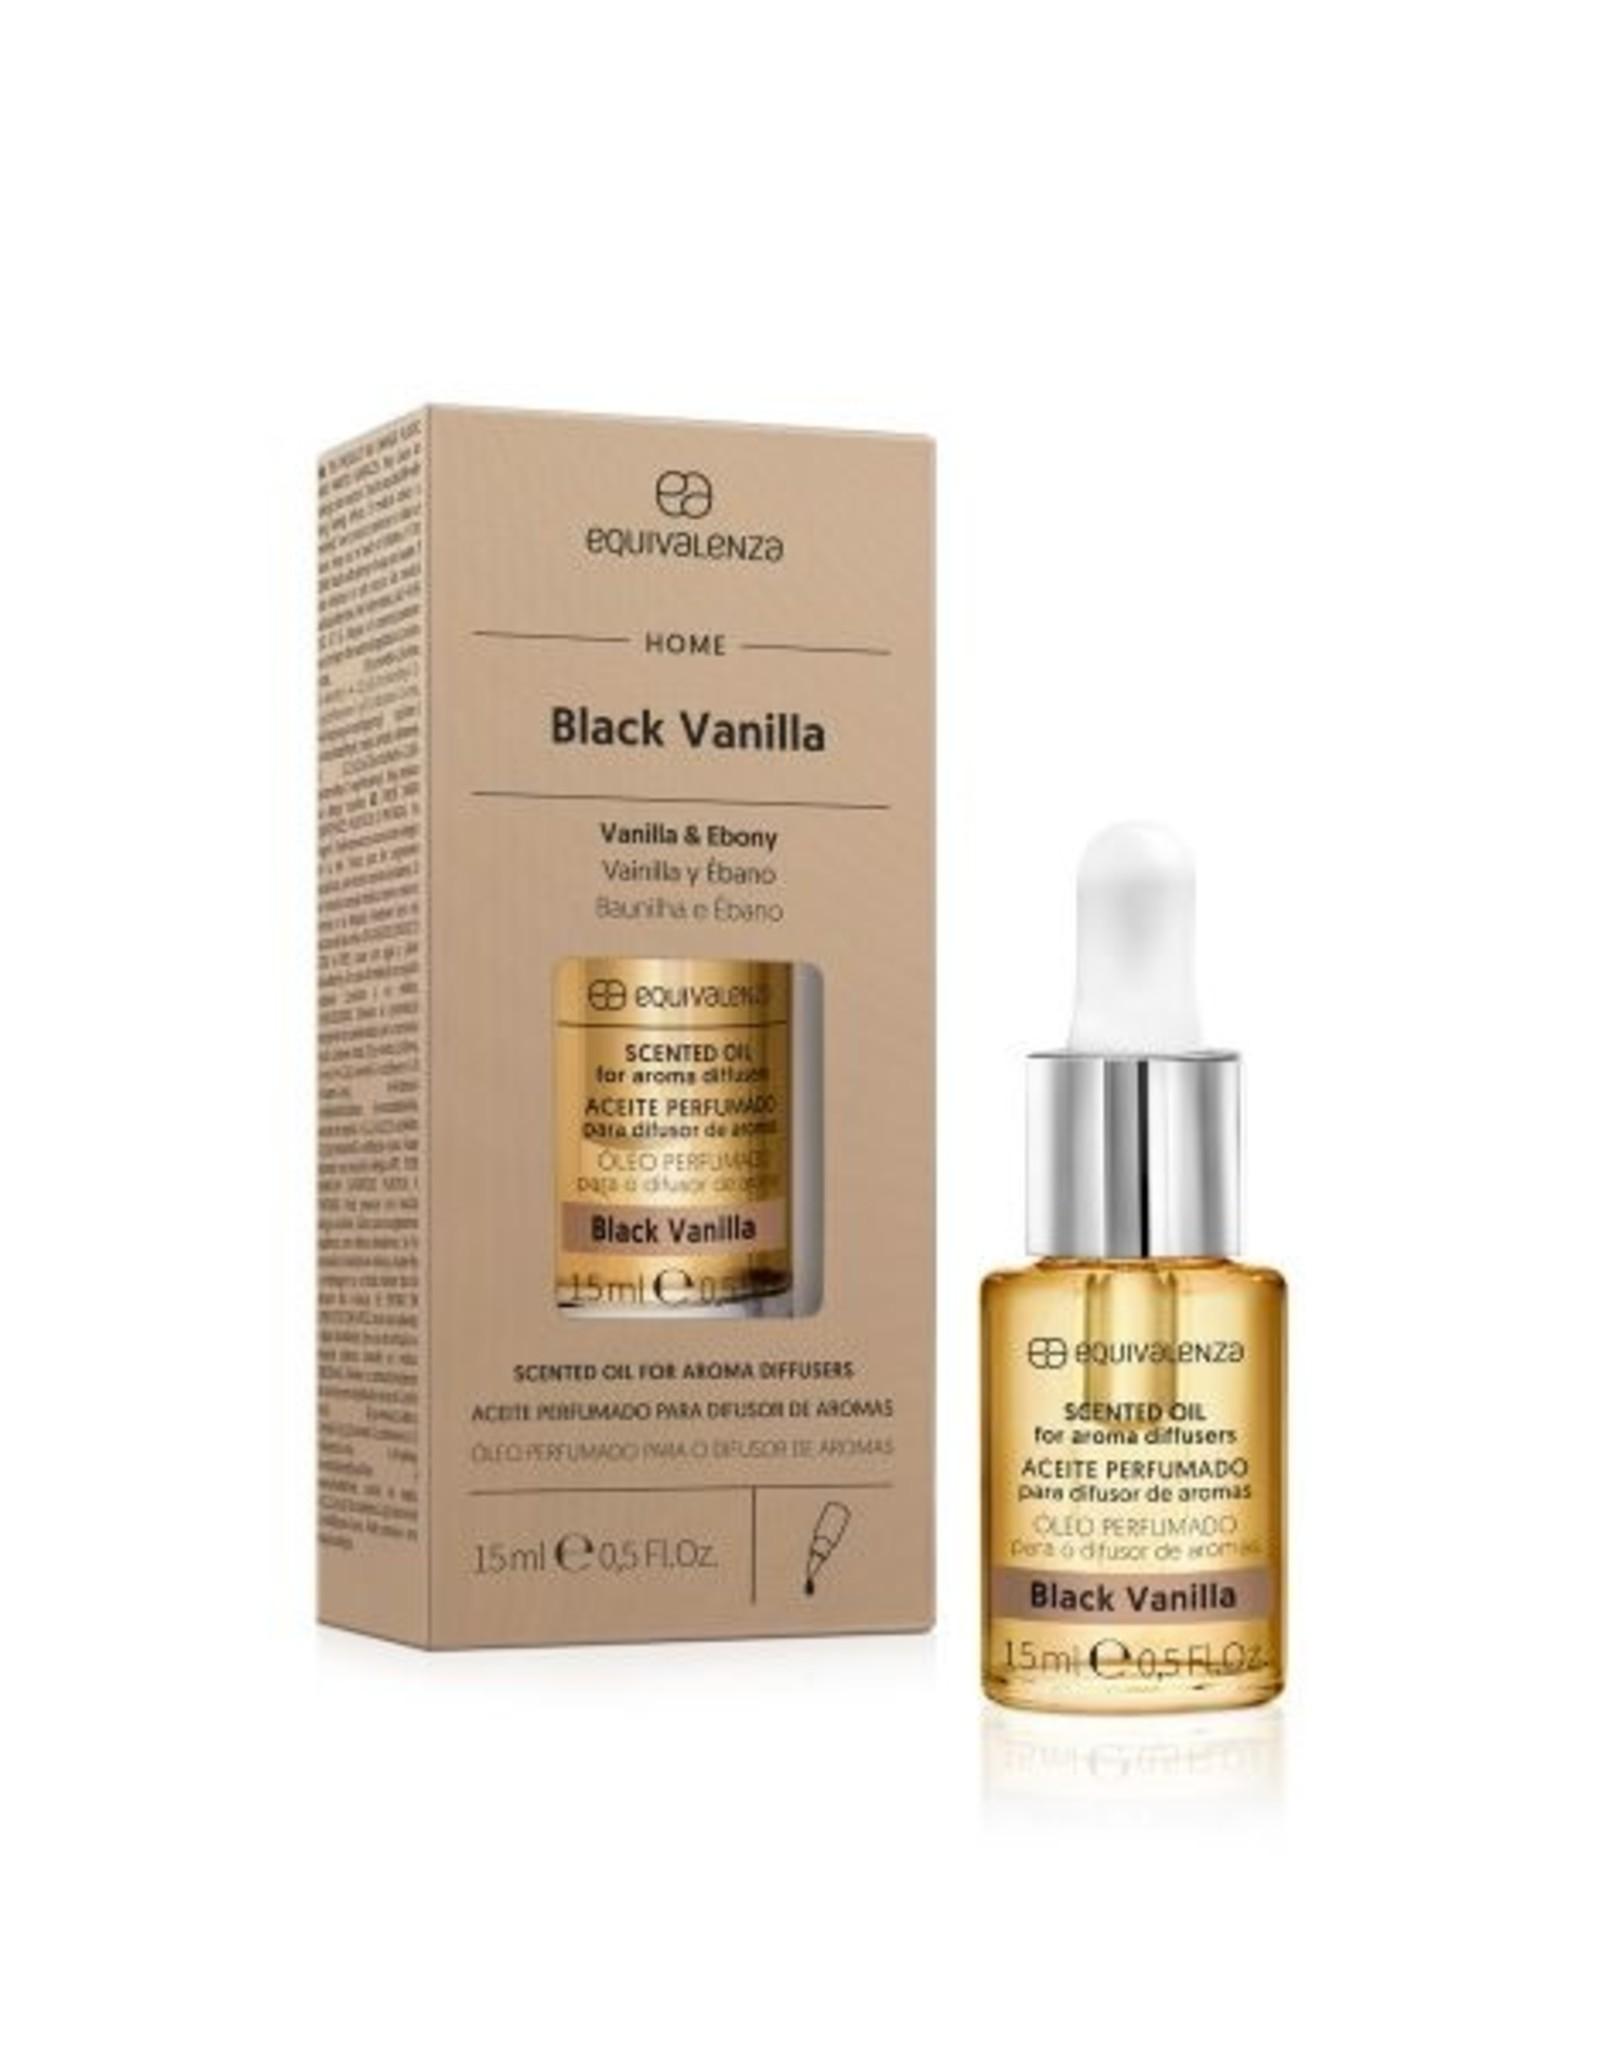 Equivalenza Essential Oil – Black Vanilla (black vanilla and ebony)